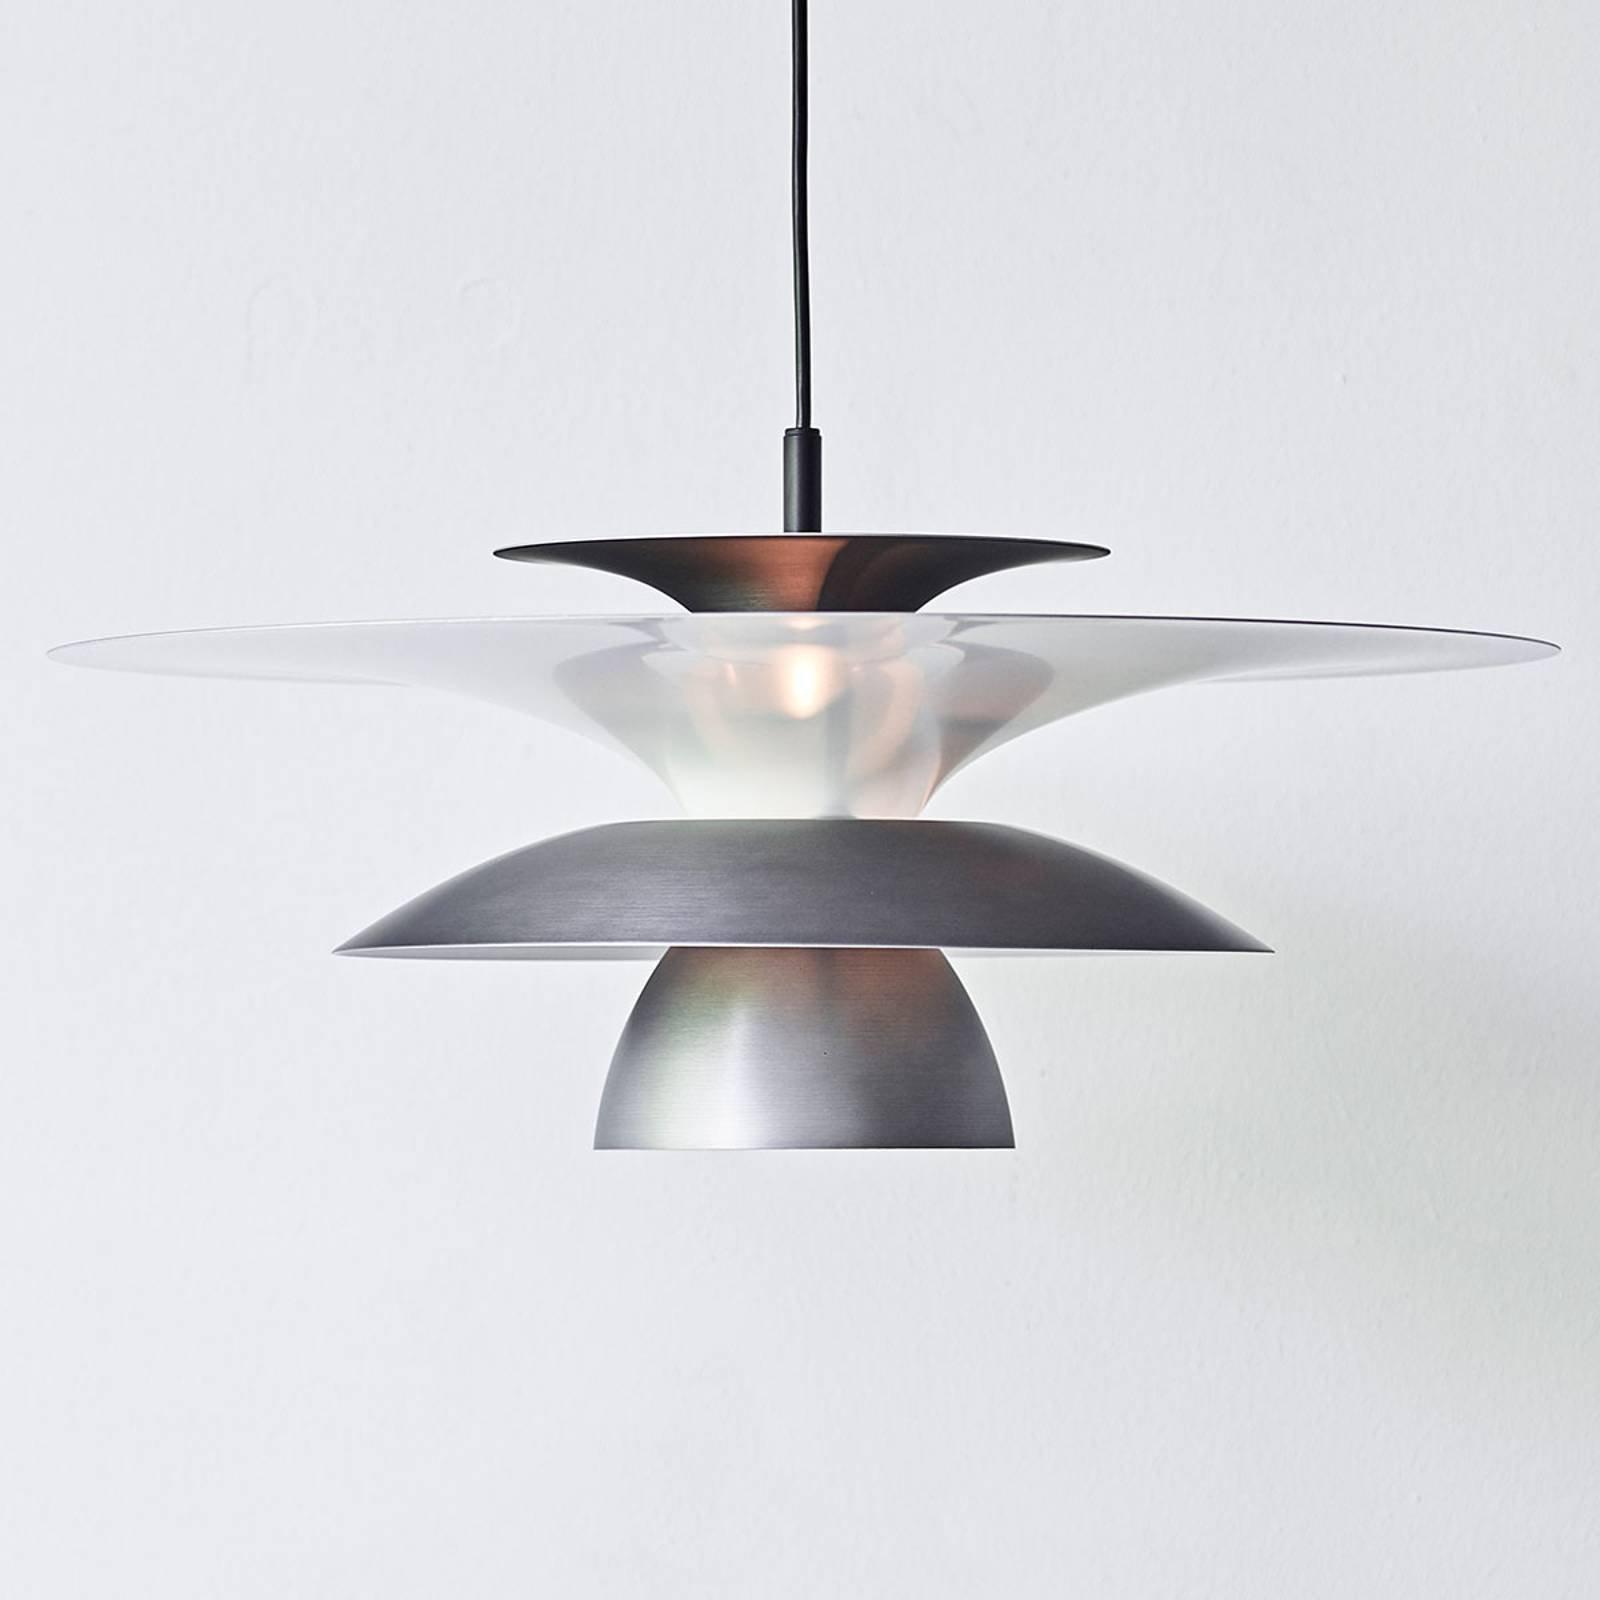 LED-pendellampe Picasso 1 lyskilde Ø 38cm oksidgrå